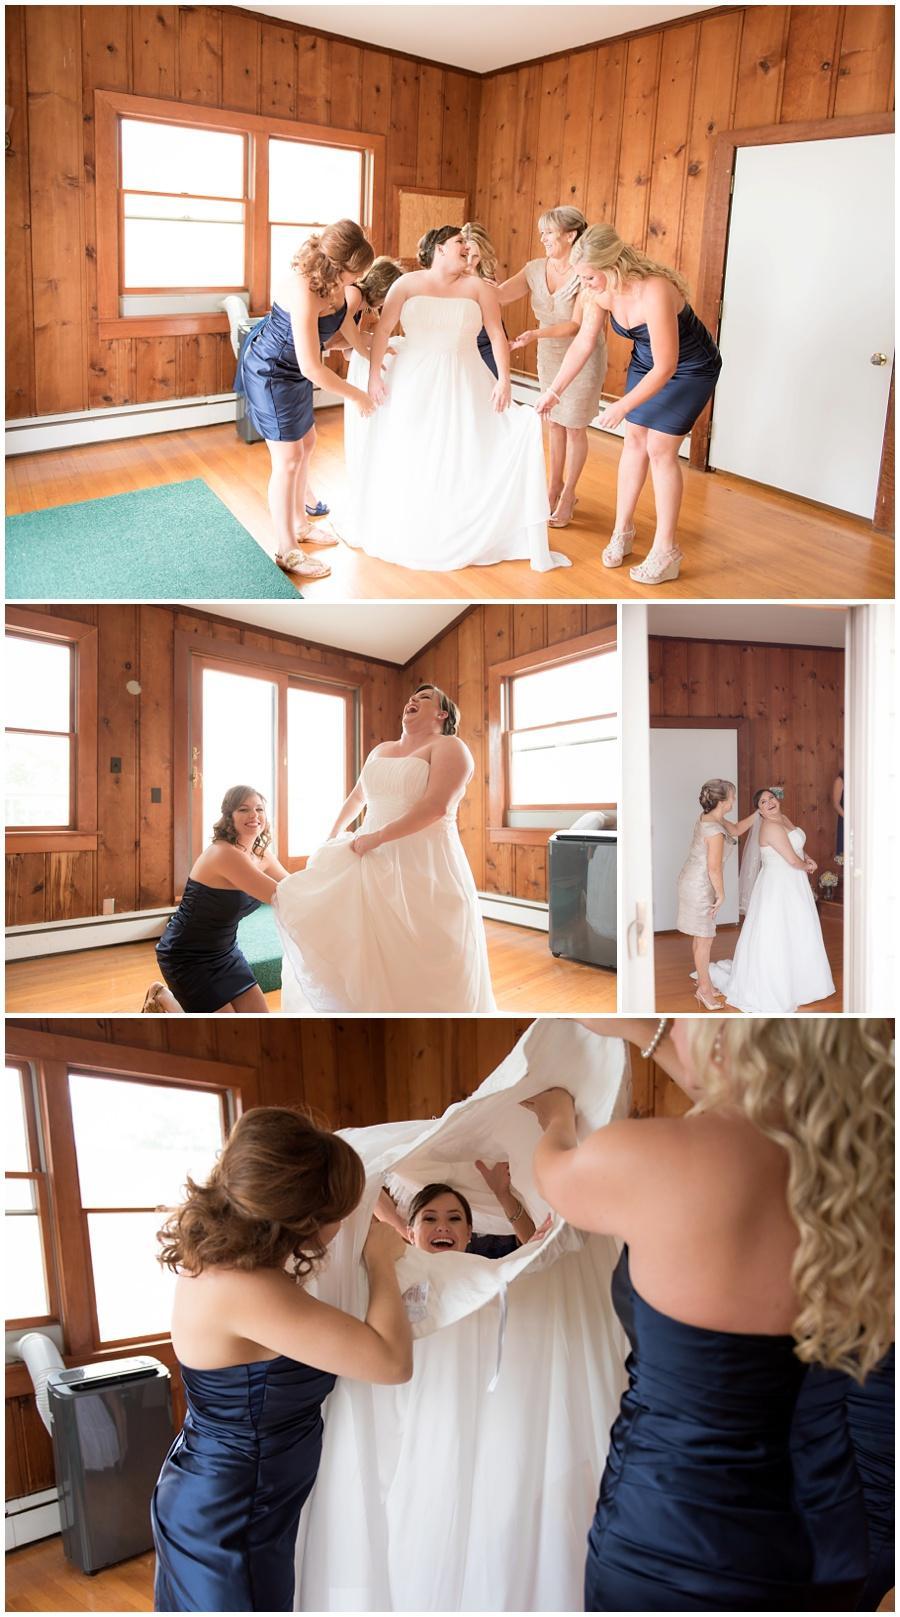 bridesmaids getting ready wedding photos